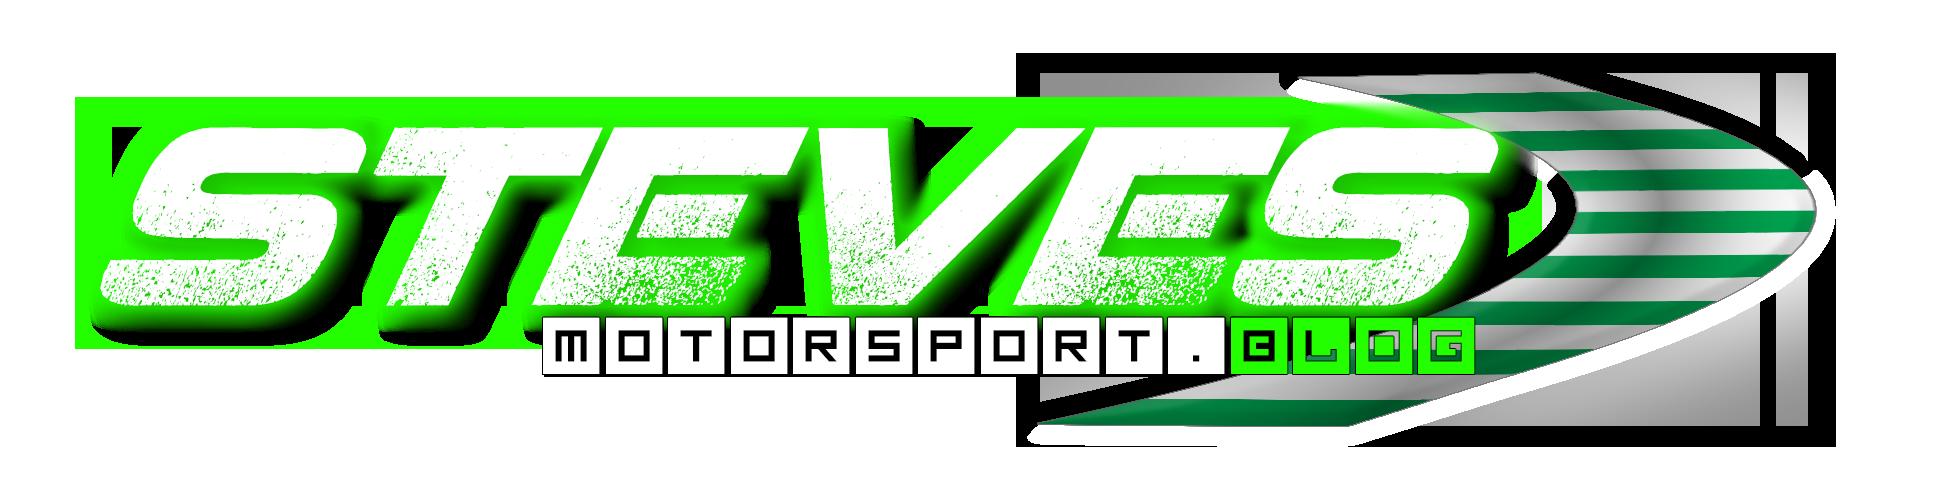 Steve's Motorsport Blog